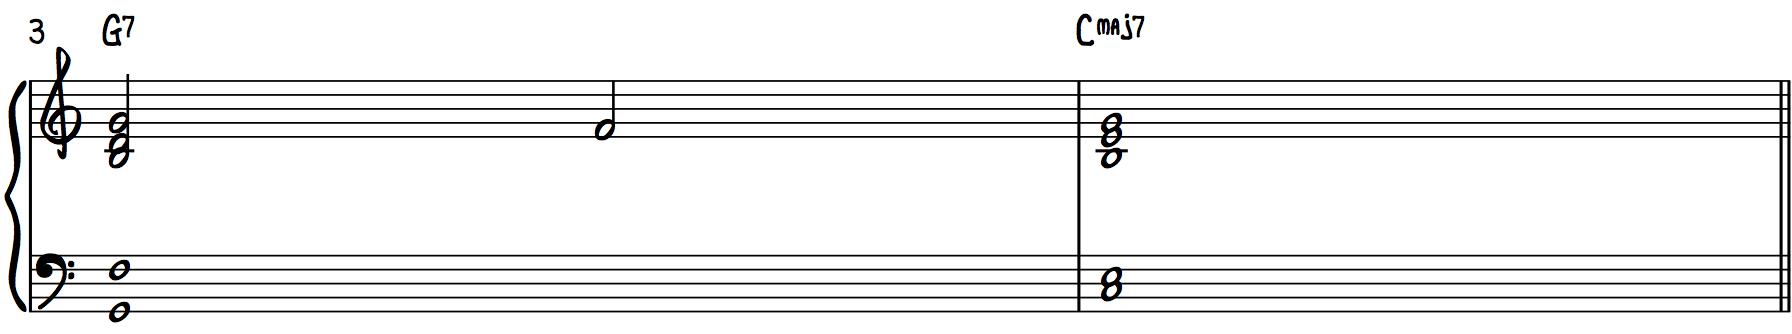 Barbershop Chords (7th Chords) Dominant V7